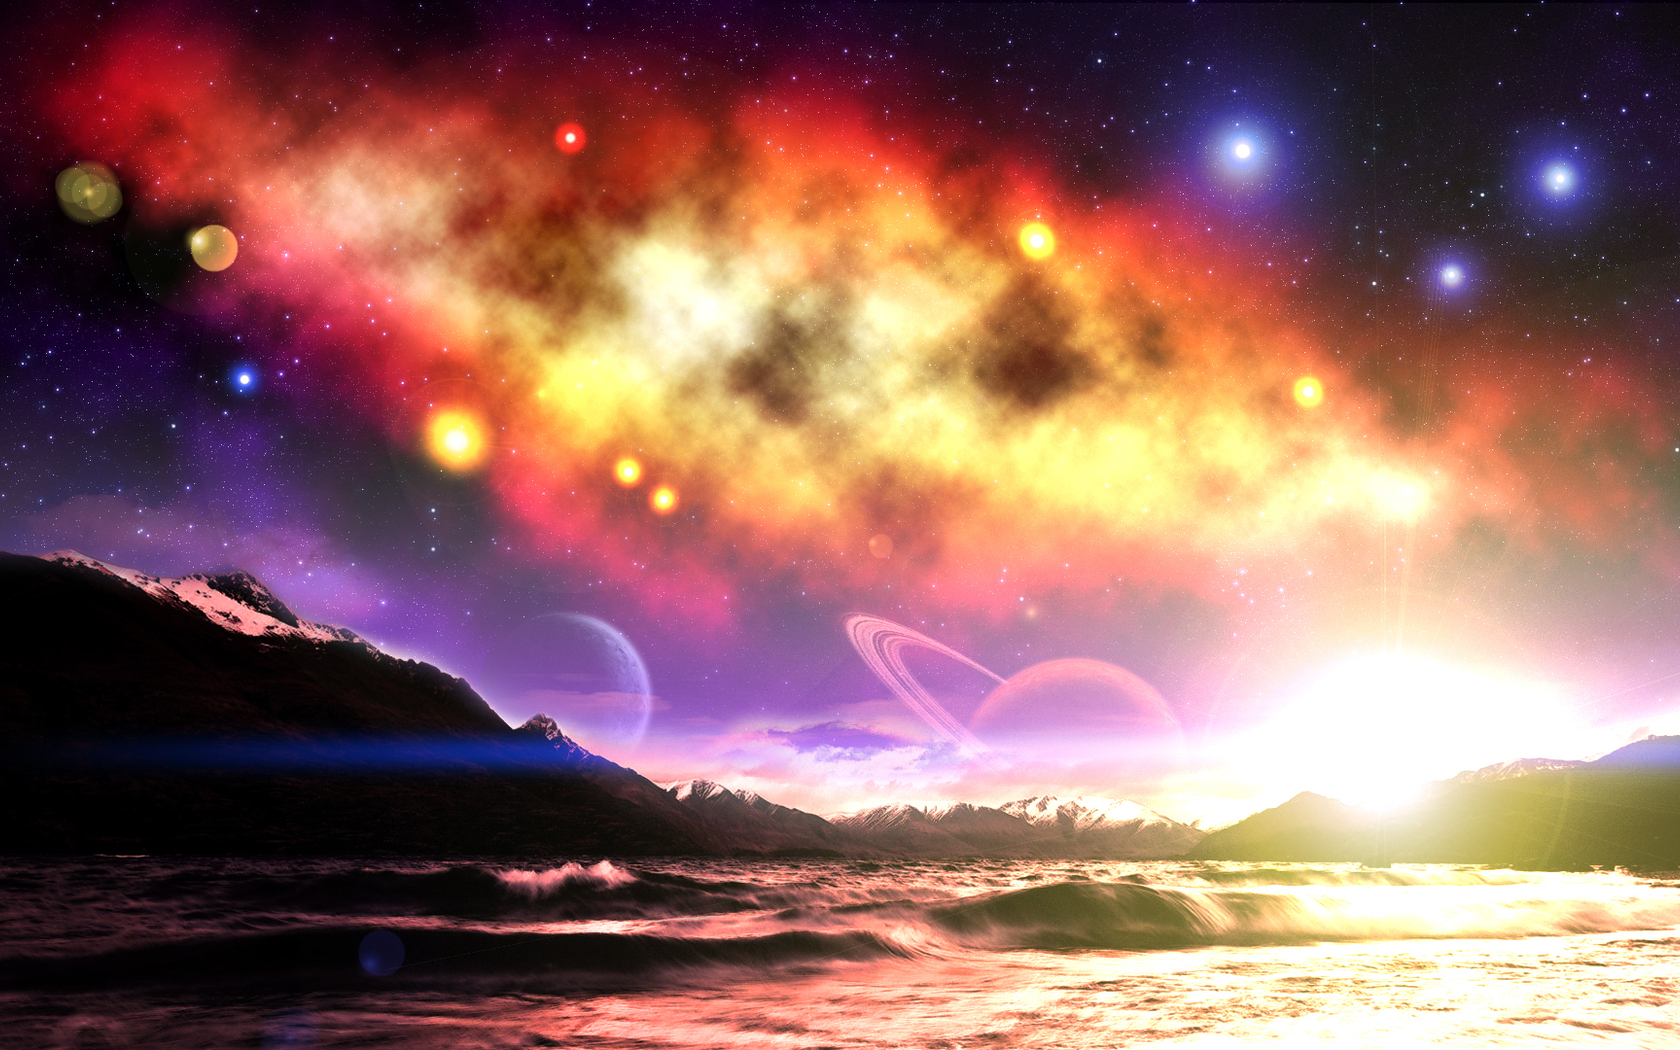 trippy galaxy wallpaper - photo #11